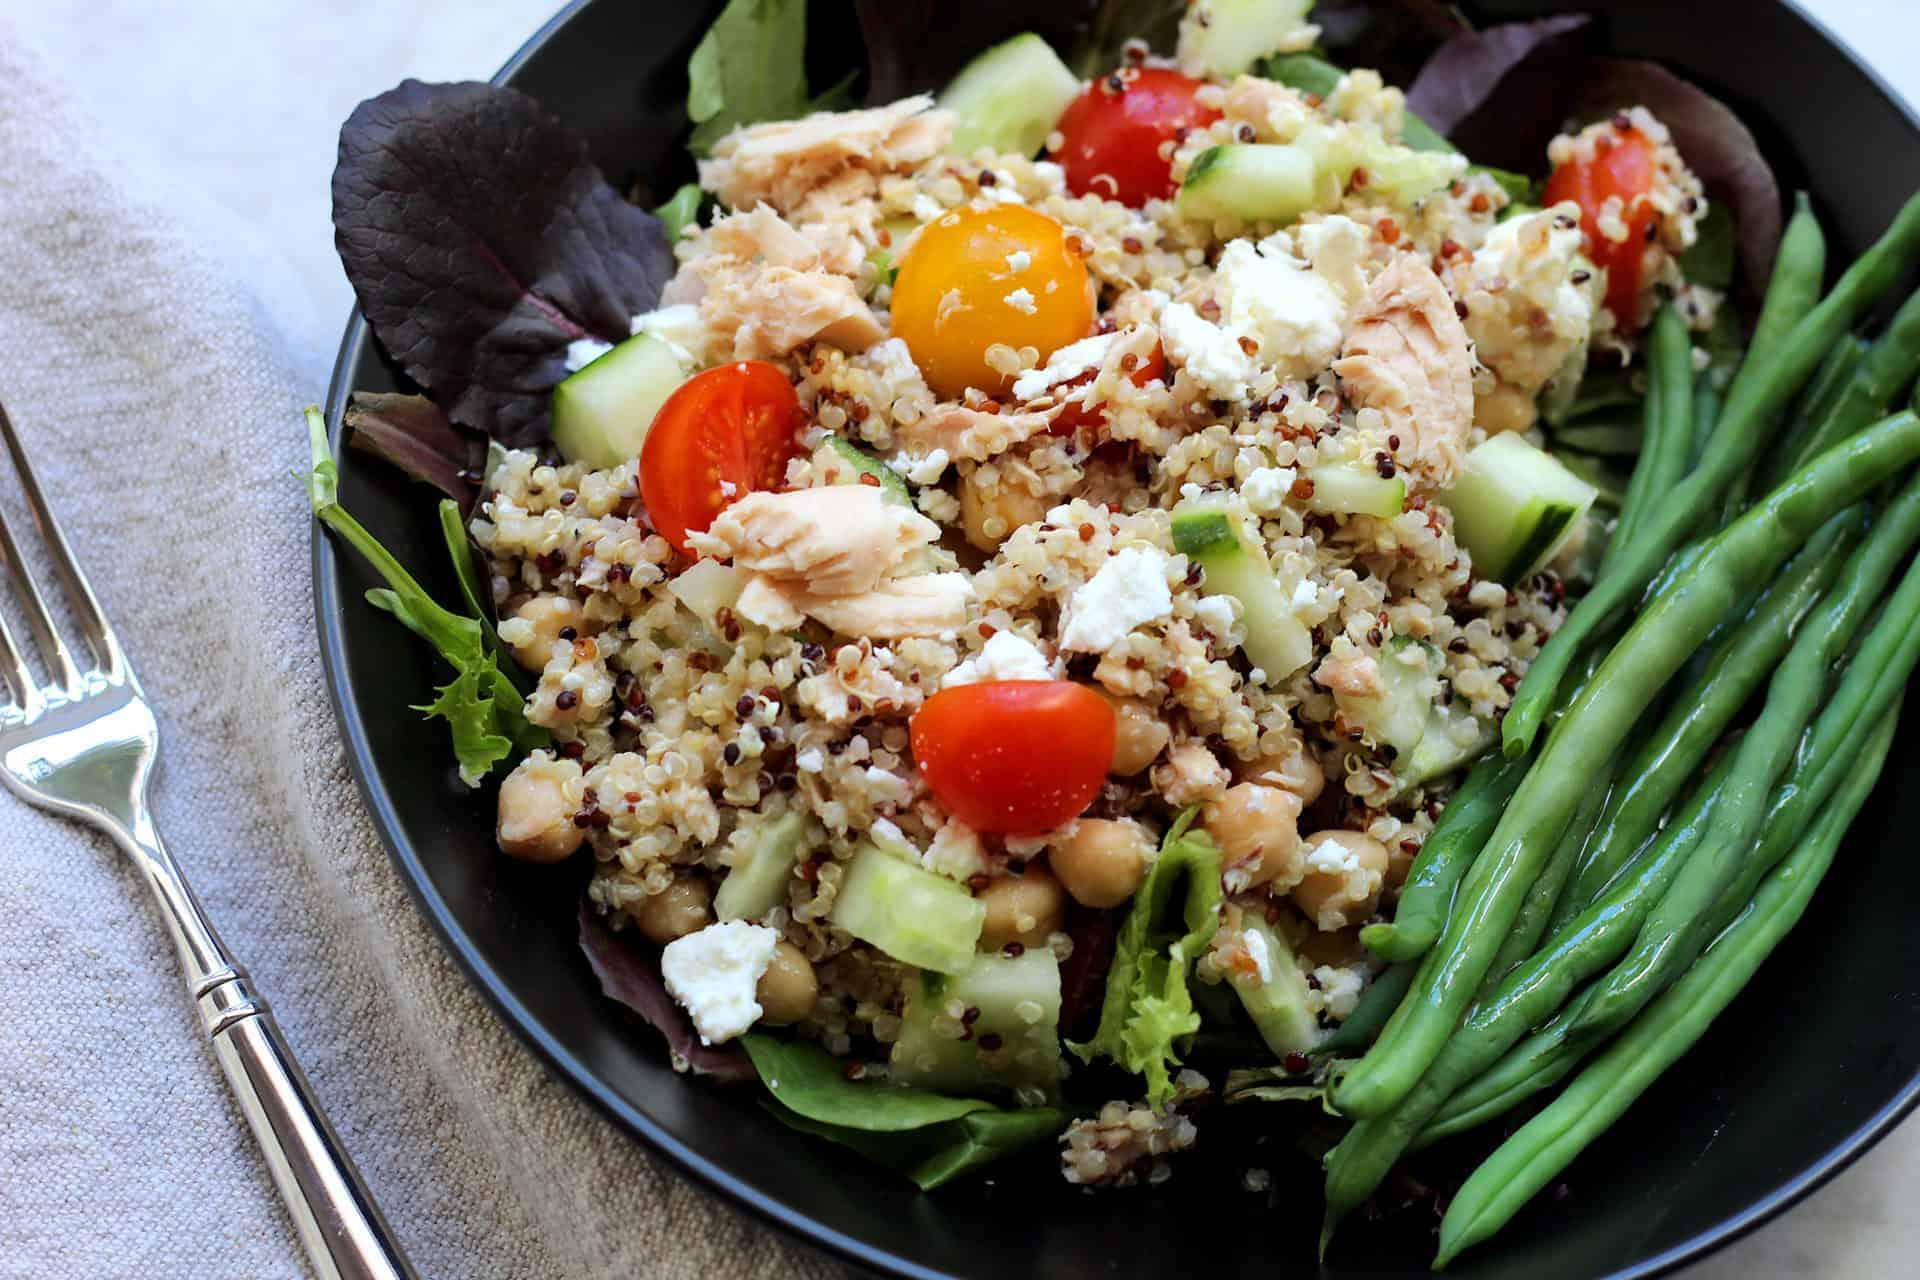 Mediterranean Diet, Greek, Tuna, Fish, Seafood, Quinoa, Whole Grains, Bowls, Quick & Easy, Lunch